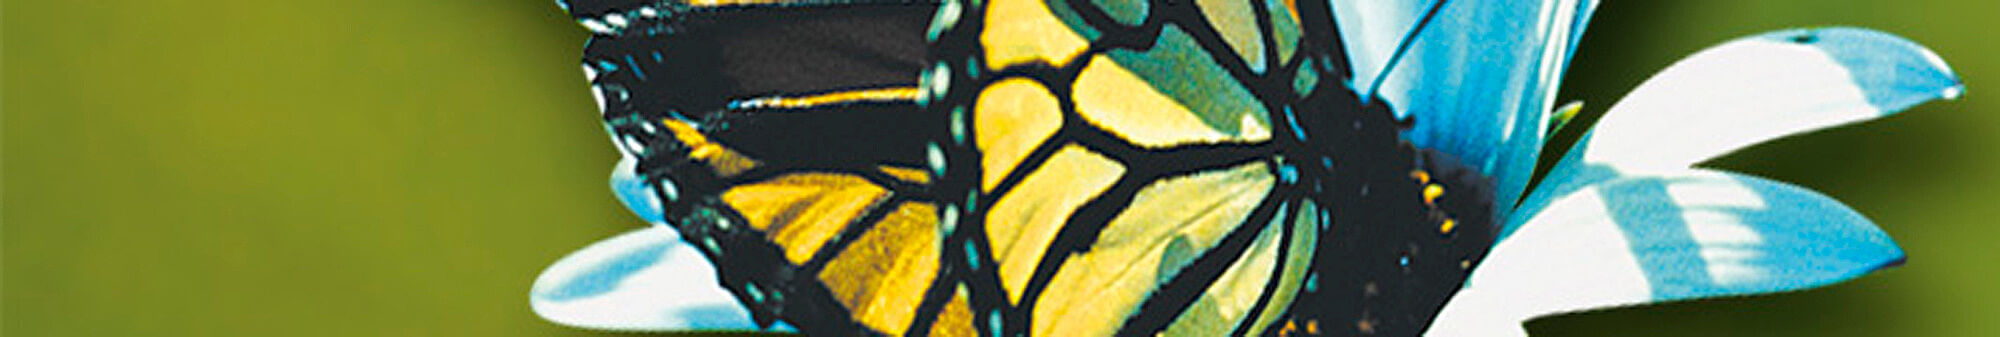 ROHS Reach Titelbild 2000px